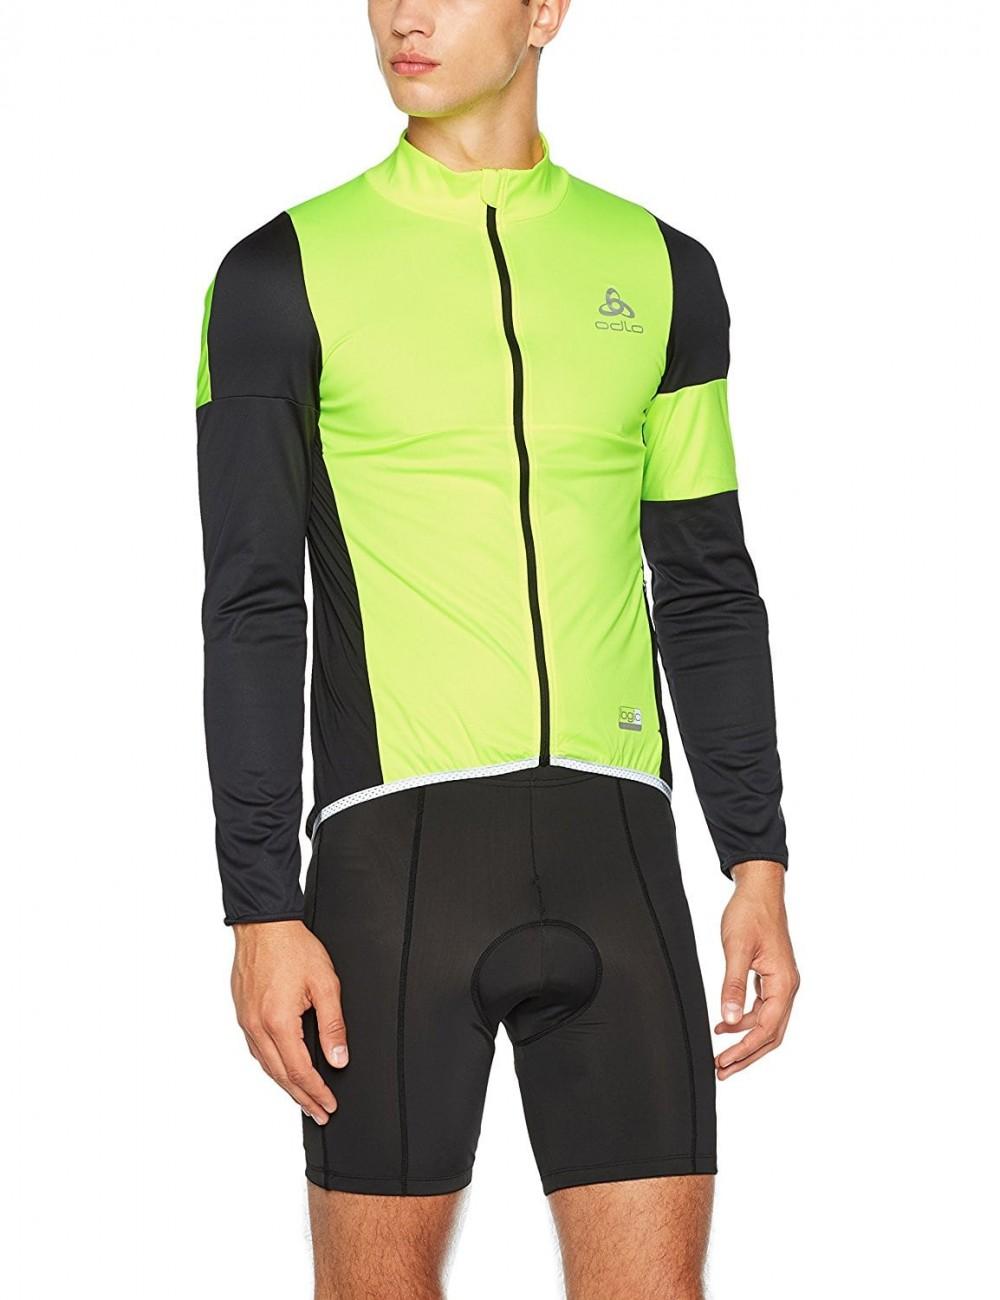 Куртка ODLO mistral logic jacket (размер L) - 1